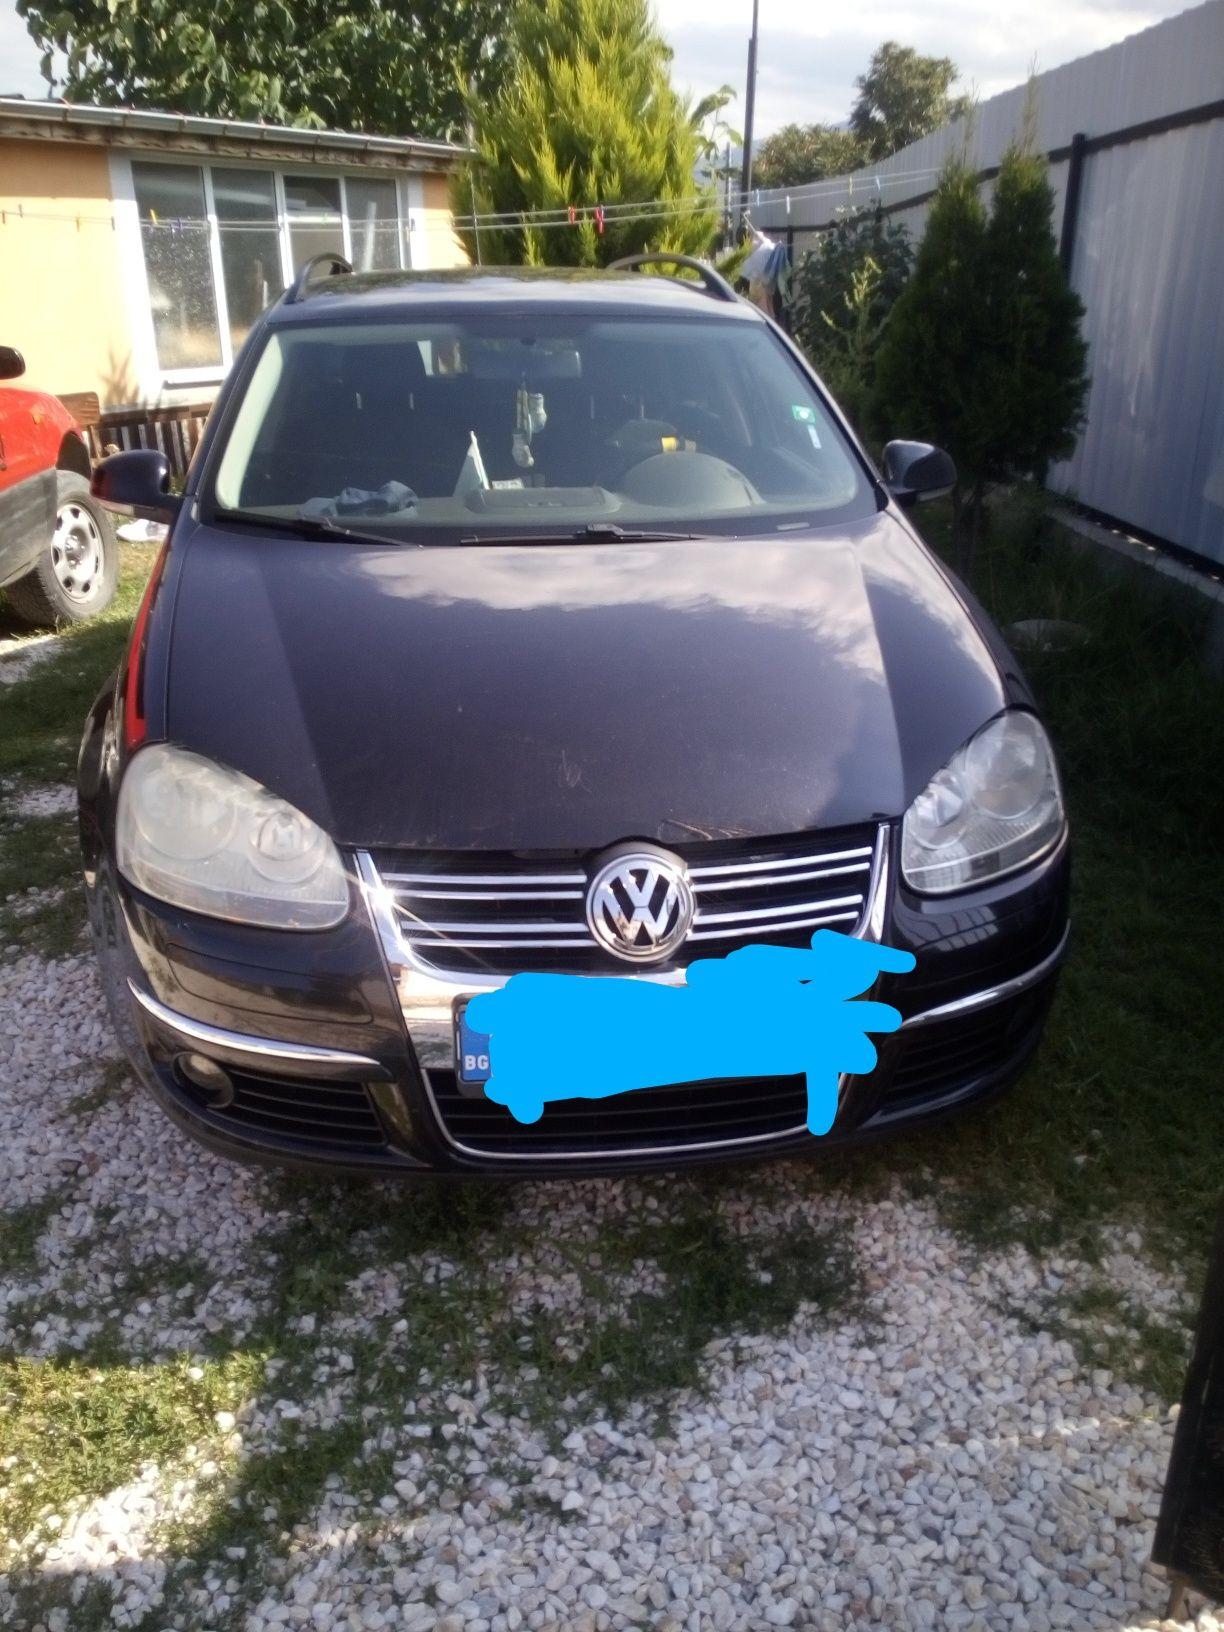 VW Golf 5 variant